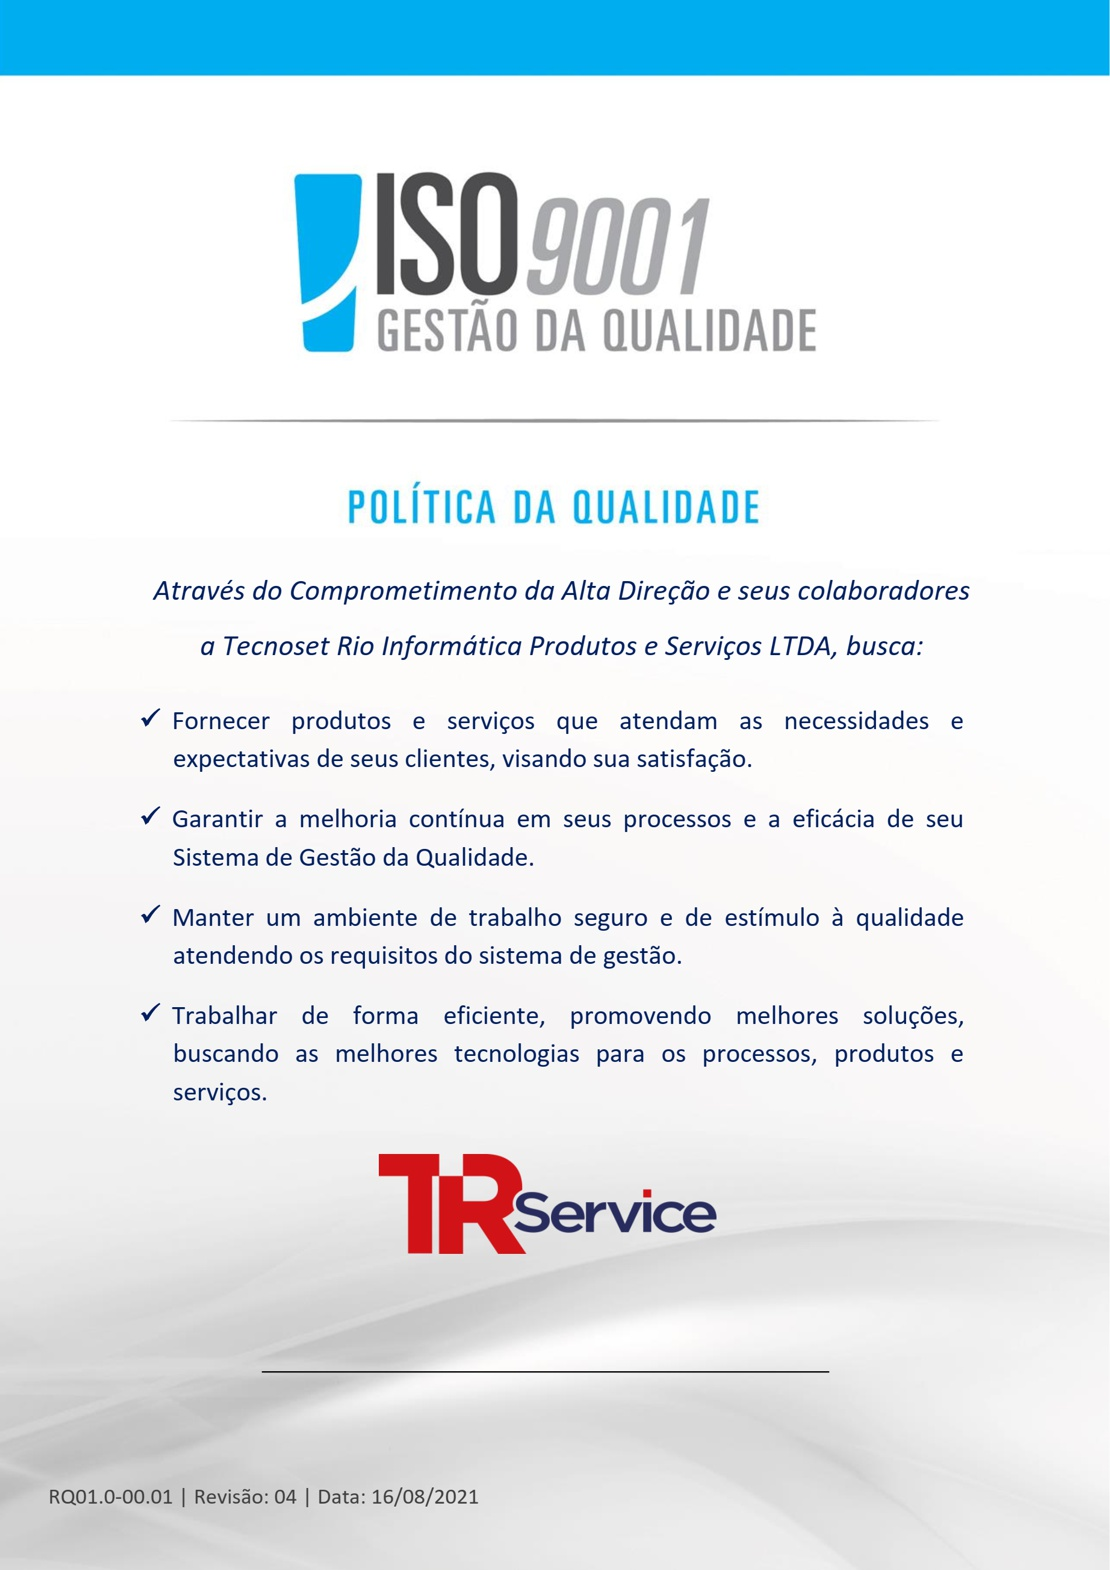 TRSERVICE - Politica da Qualidade